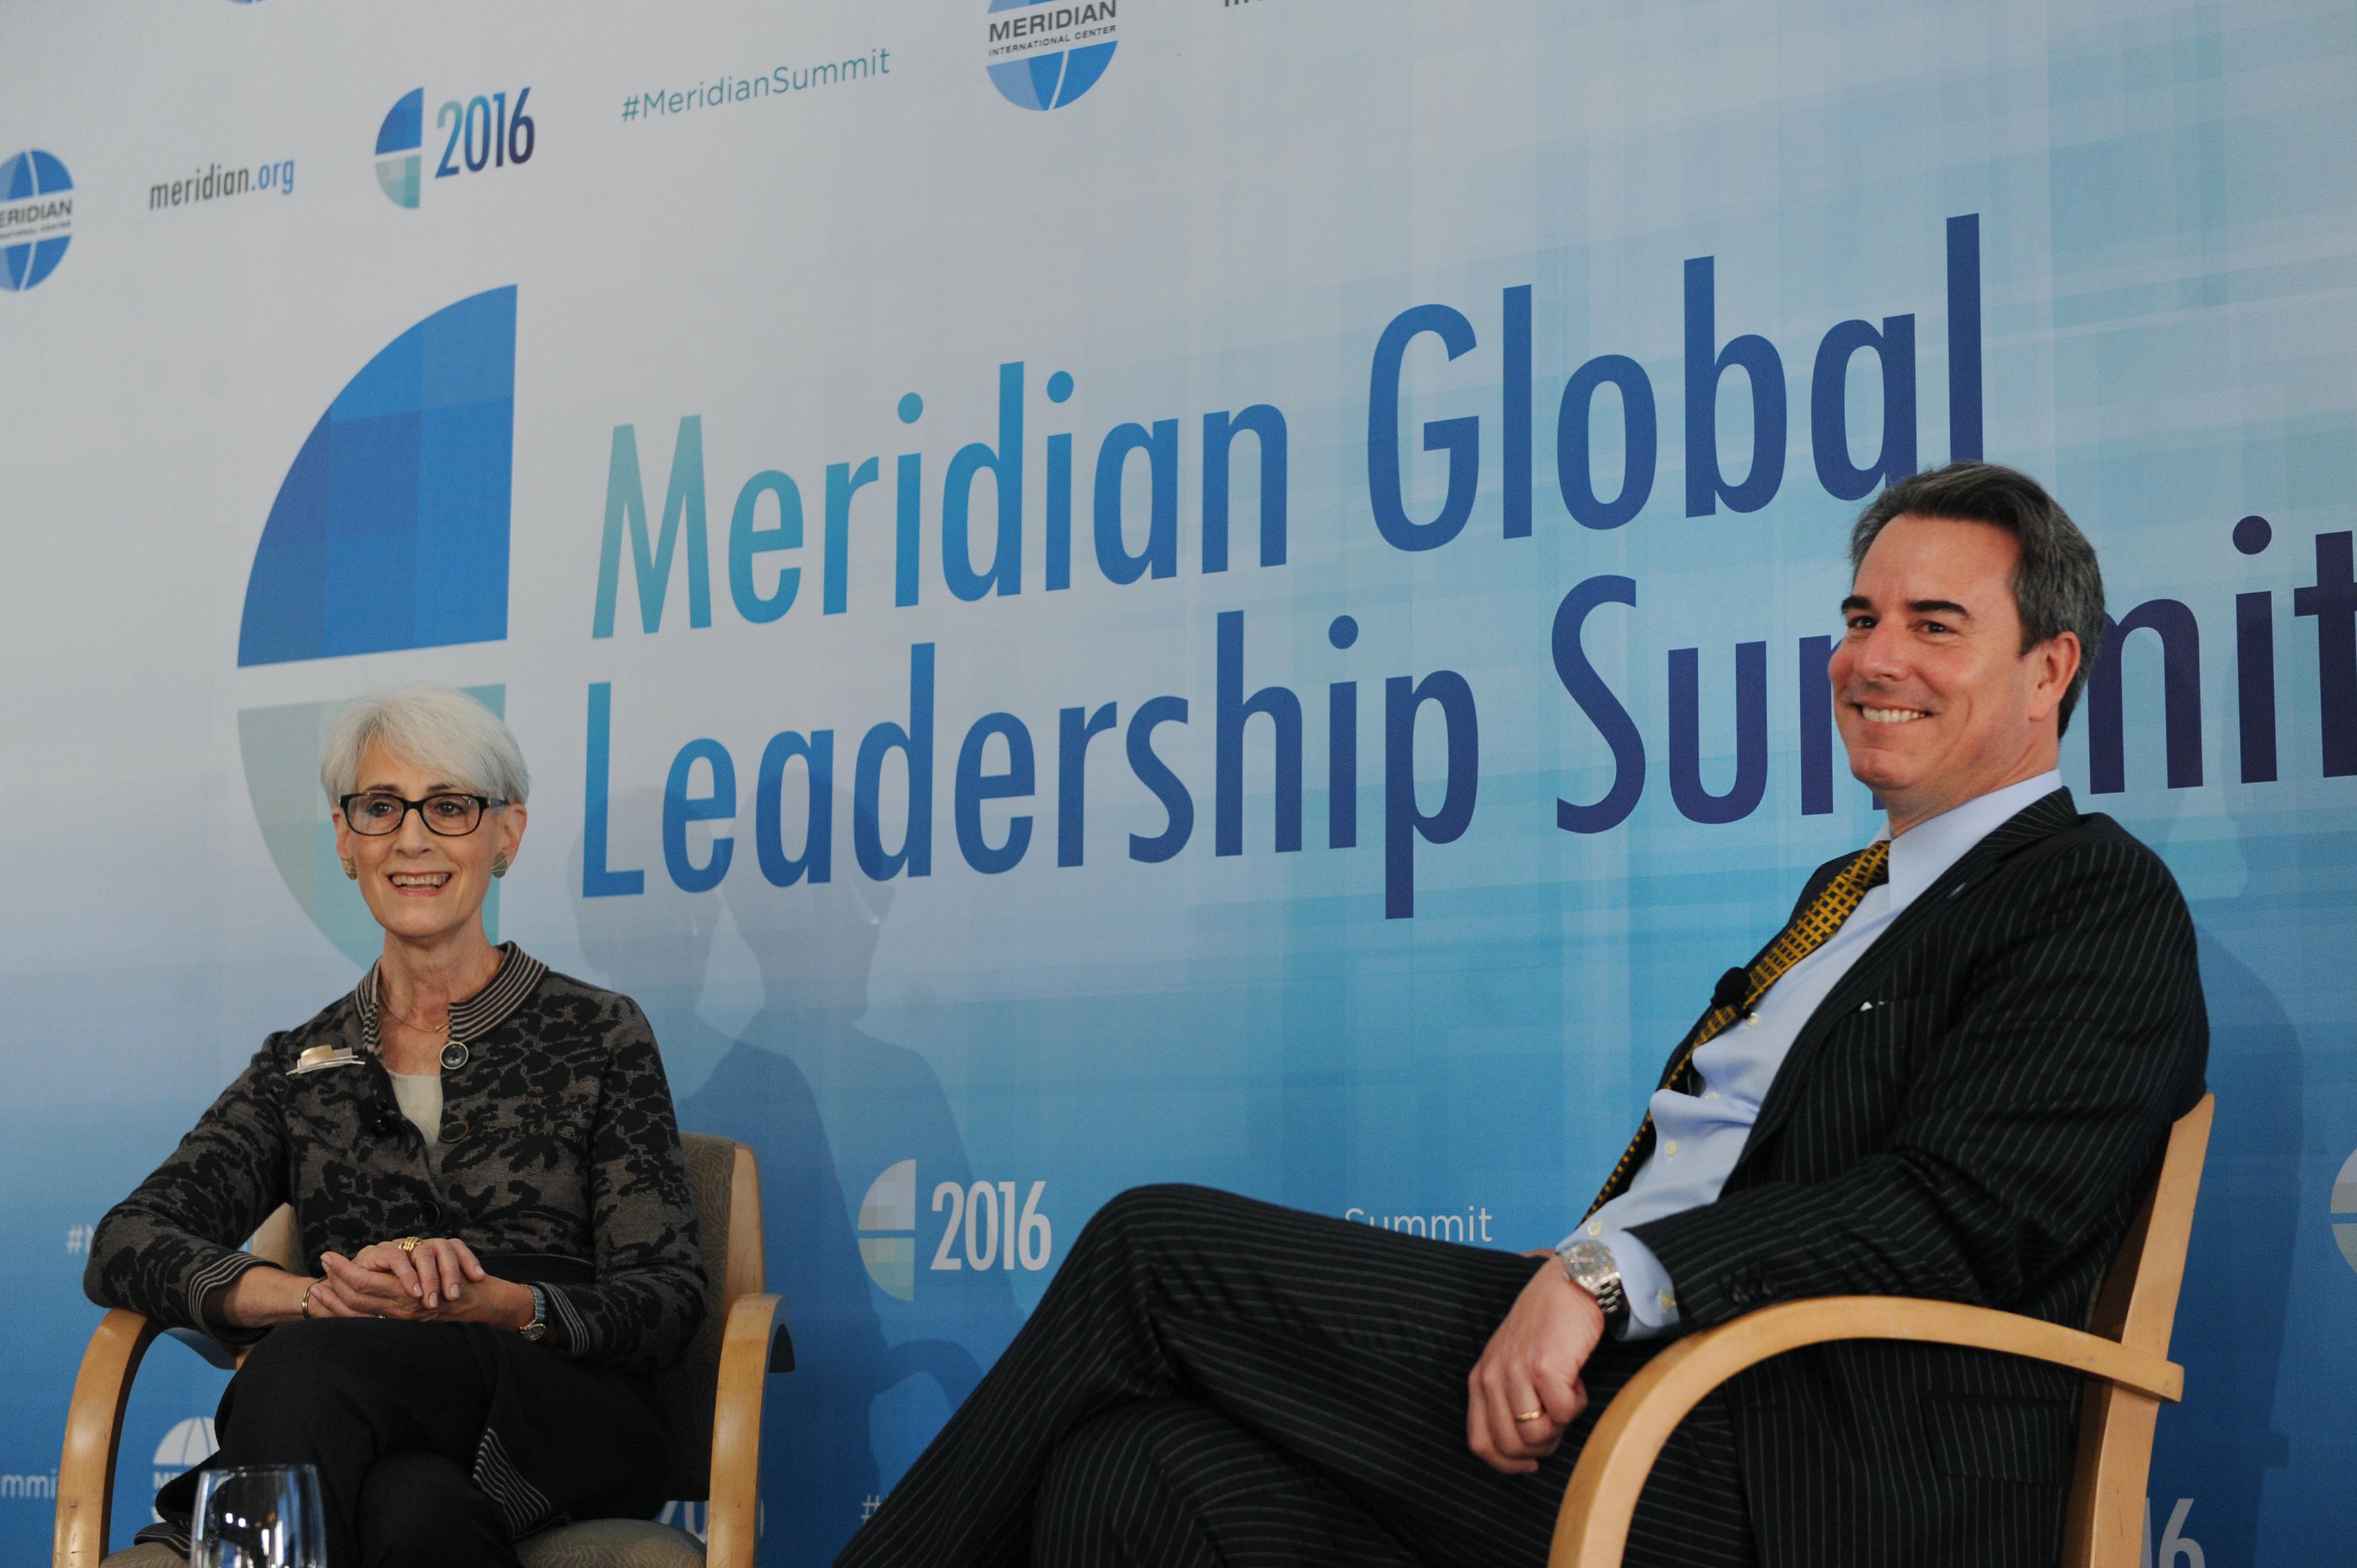 Ambassador Wendy Sherman, Senior Counselor, Albright Stonebridge Group and Ambassador Stuart Holliday, President and CEO, Meridian International Center